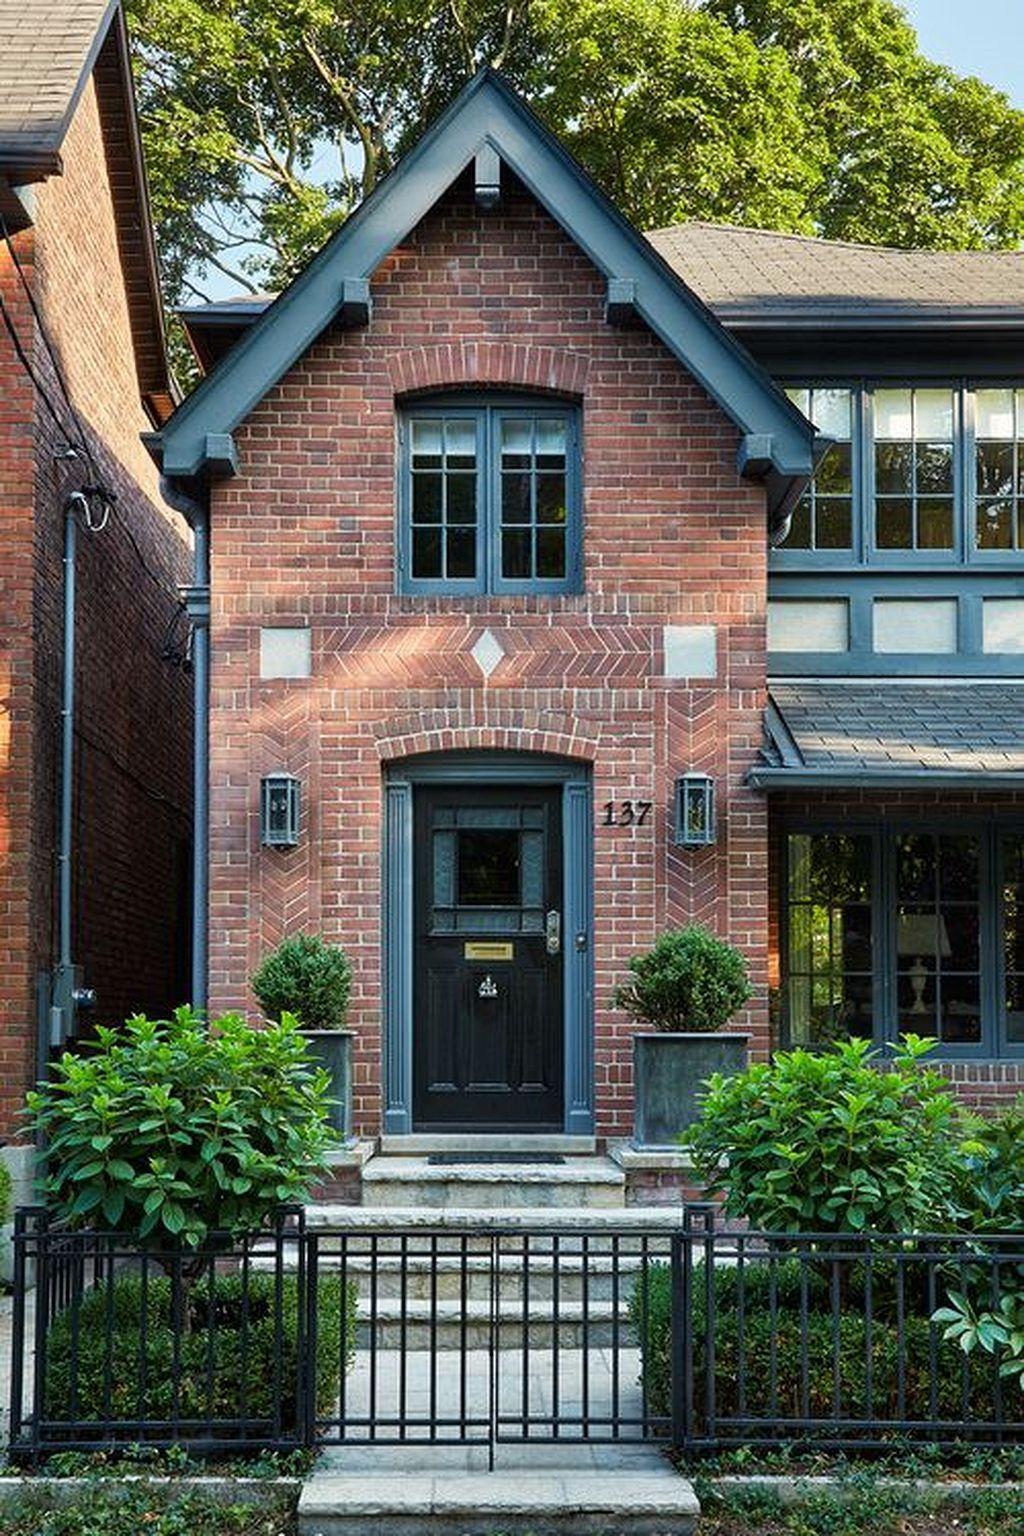 50+ Modern Brick Home Design Brings Innovative #exteriordesign